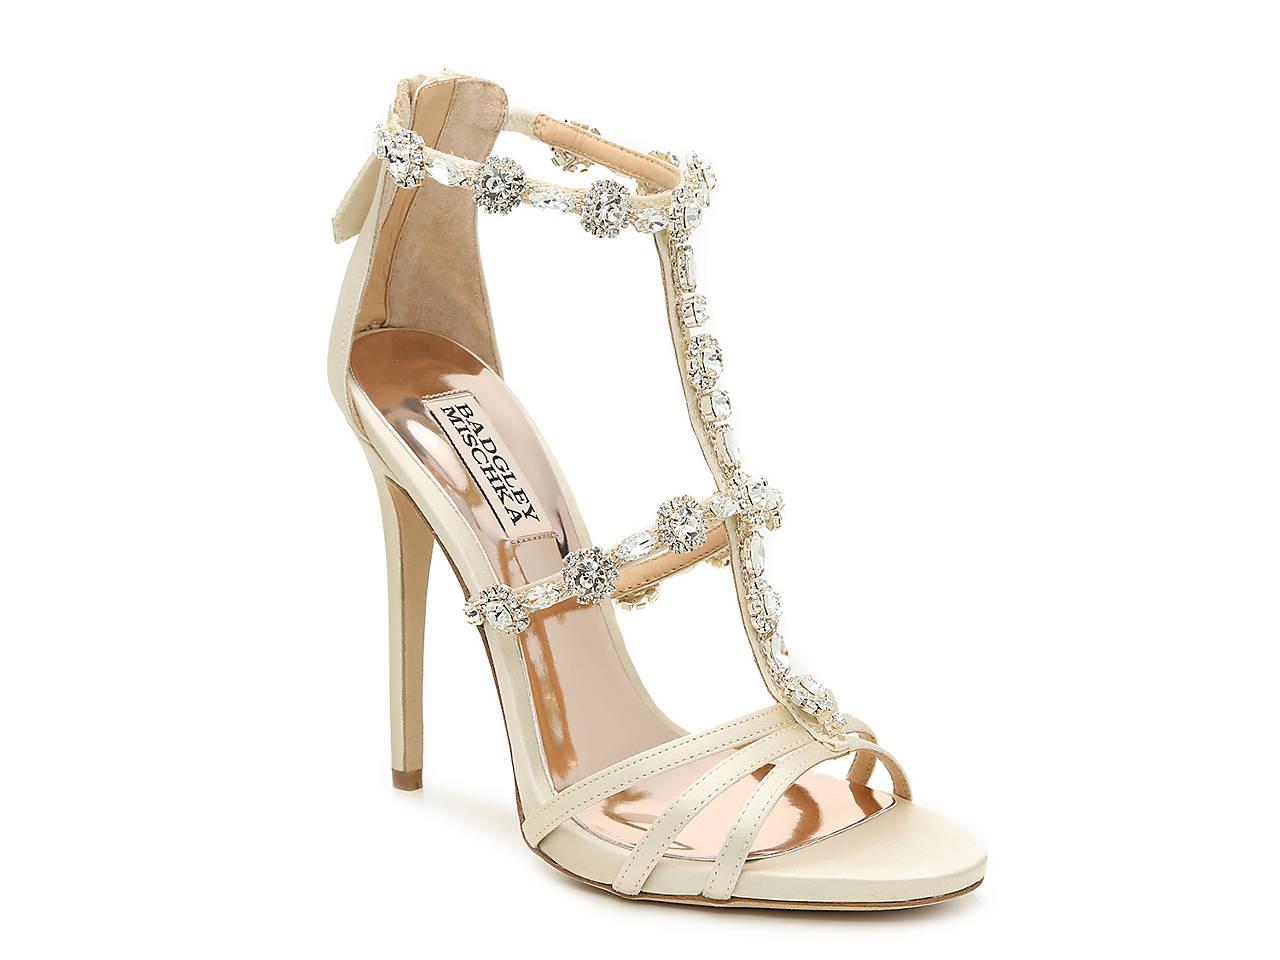 9dd6de3e Badgley Mischka Thelma Sandal Women's Shoes | DSW